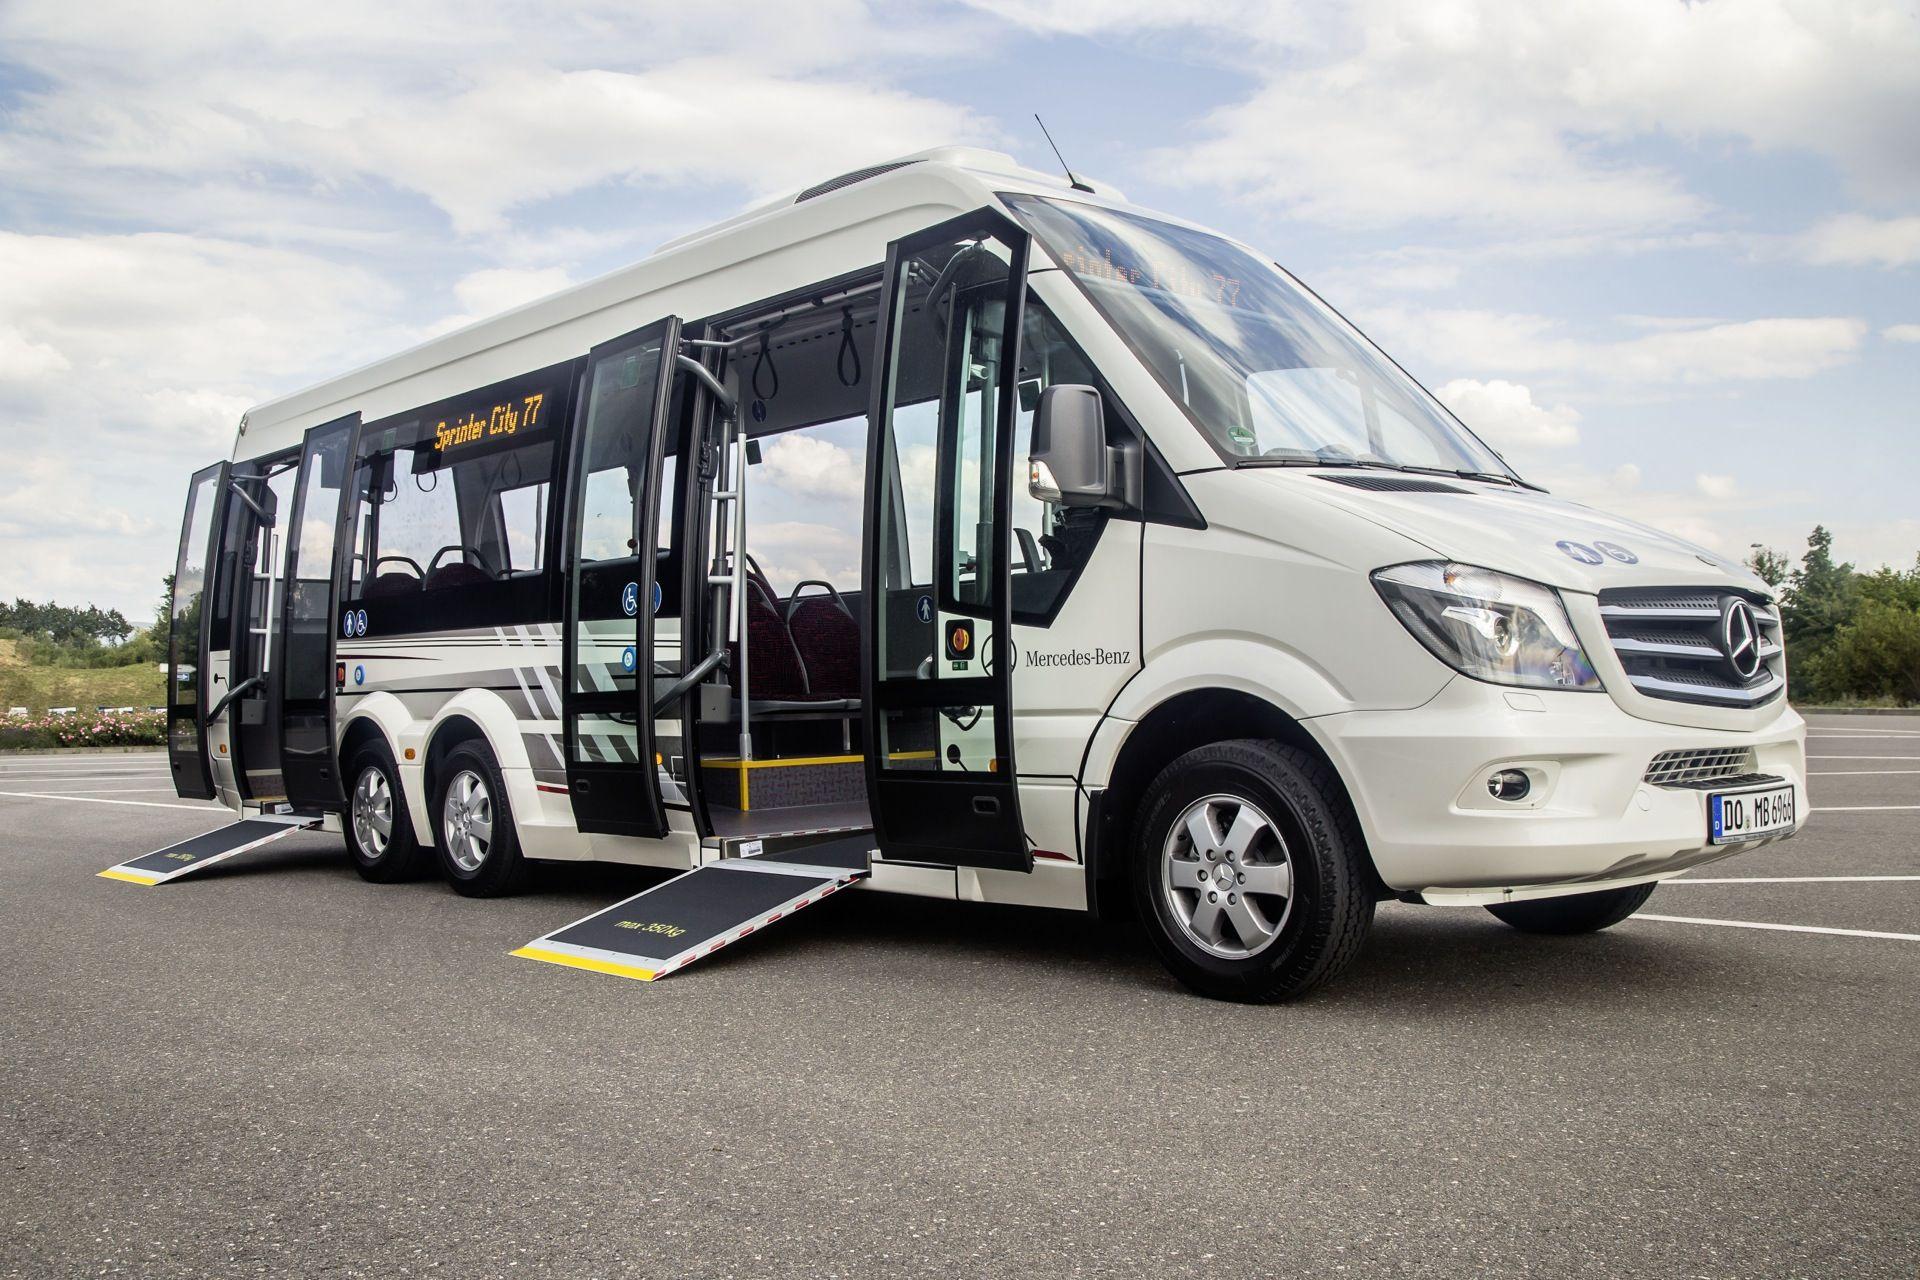 Mercedes benz sprinter city 77 buses pinterest best for Mercedes benz busses